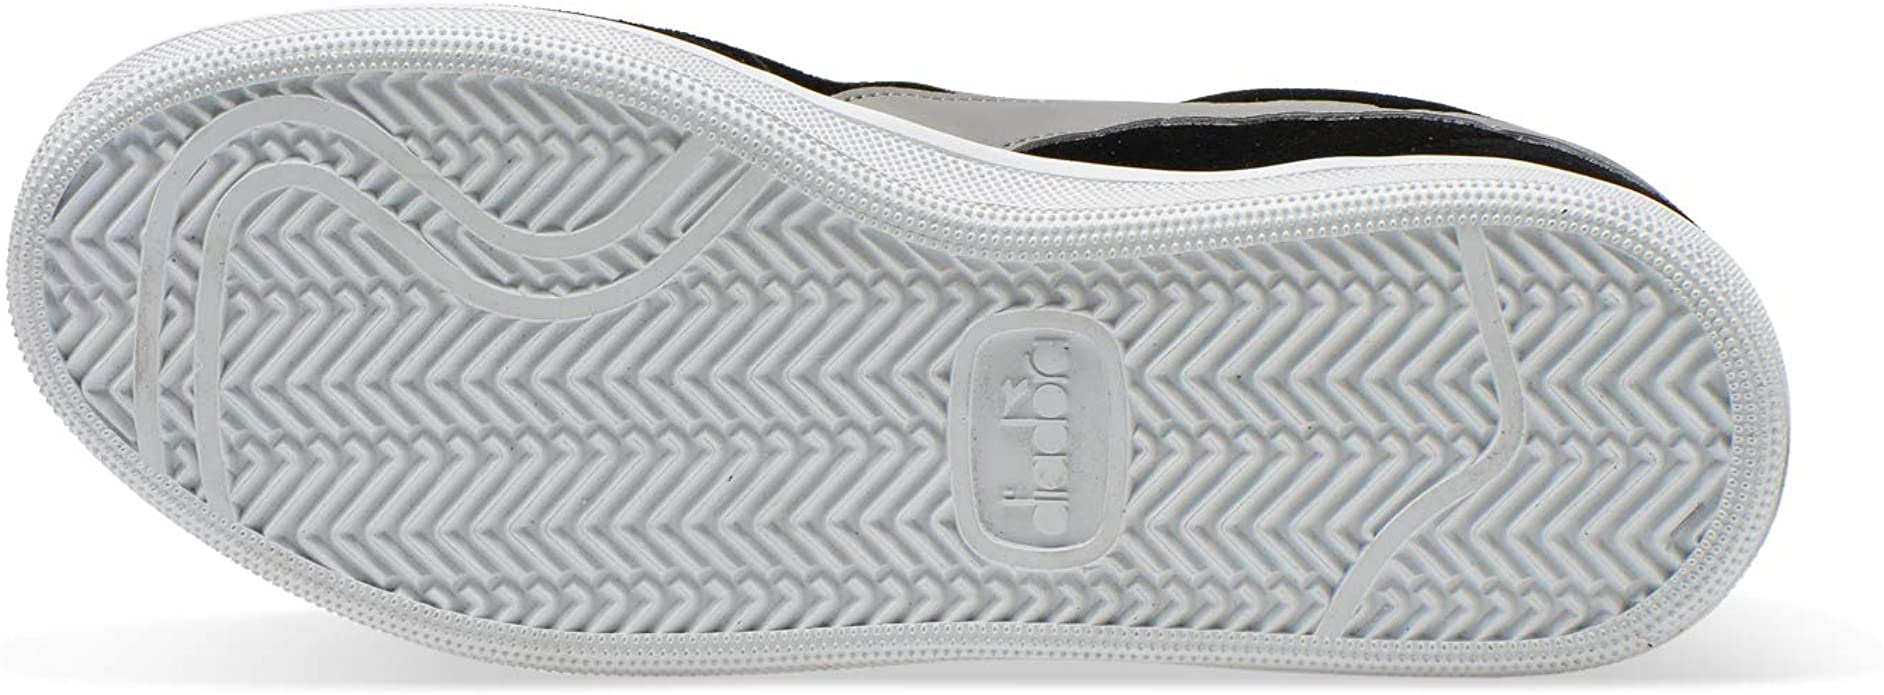 Diadora Scarpe Sportive Sneakers Sportswear lifestyle Field Uomo Blu Suede